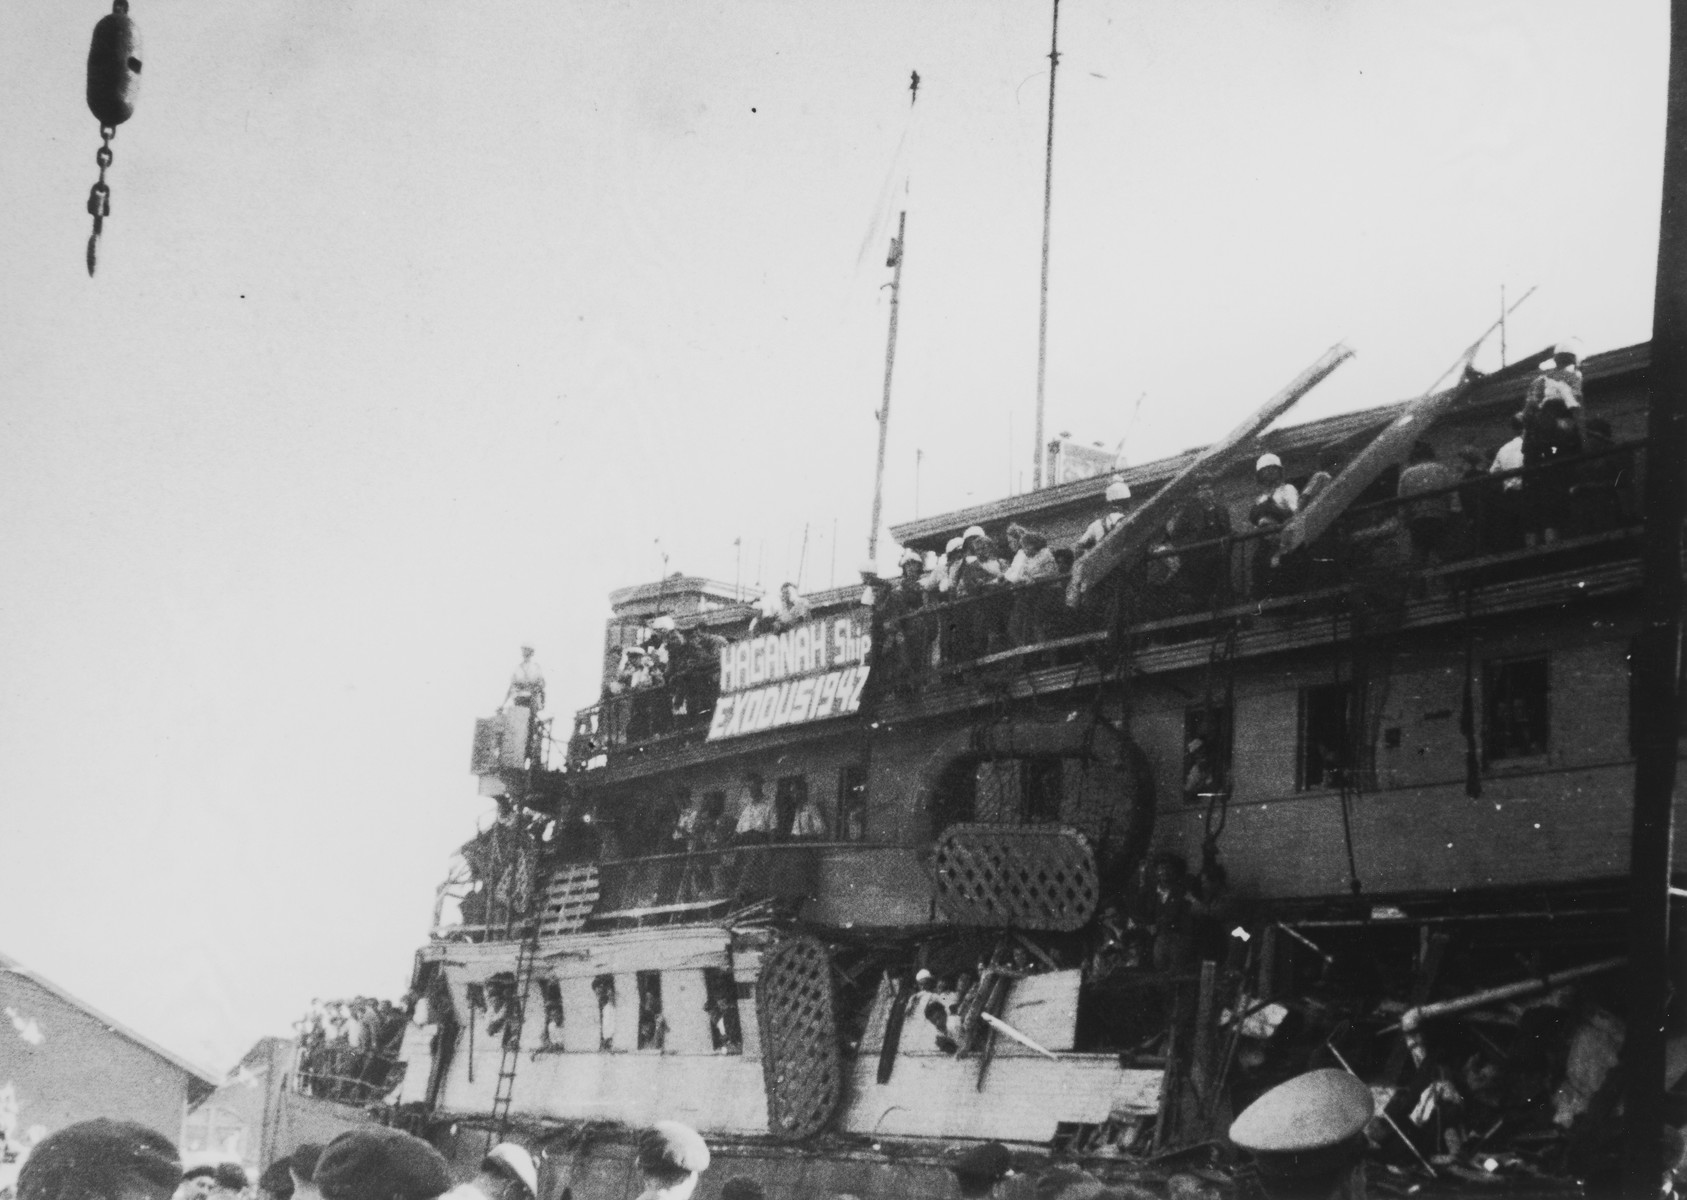 The battered illegal immigrant ship, Exodus 1947, docks in Haifa harbor.